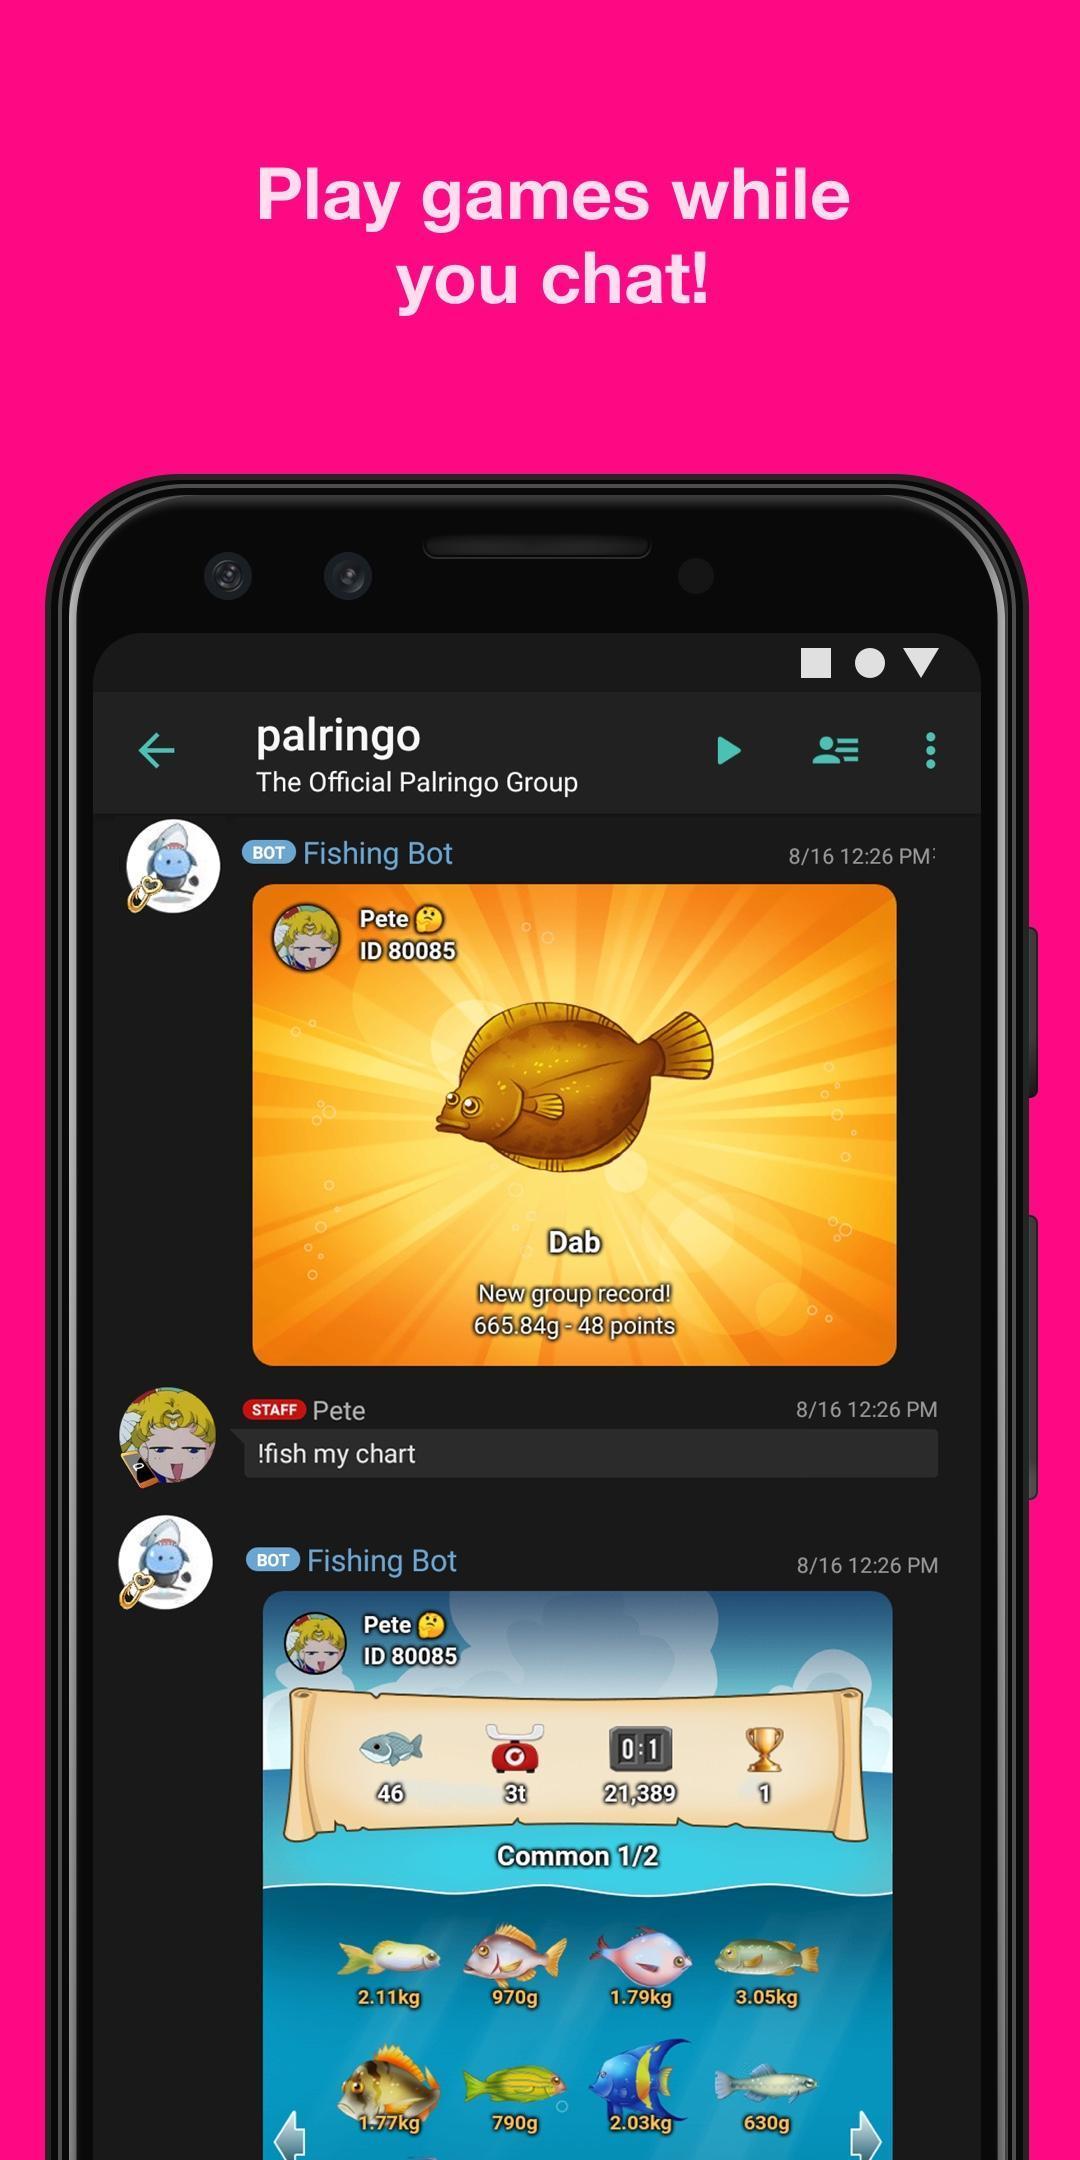 Palringo Group Messenger - chat, play games & more 9.2.1 Screenshot 3